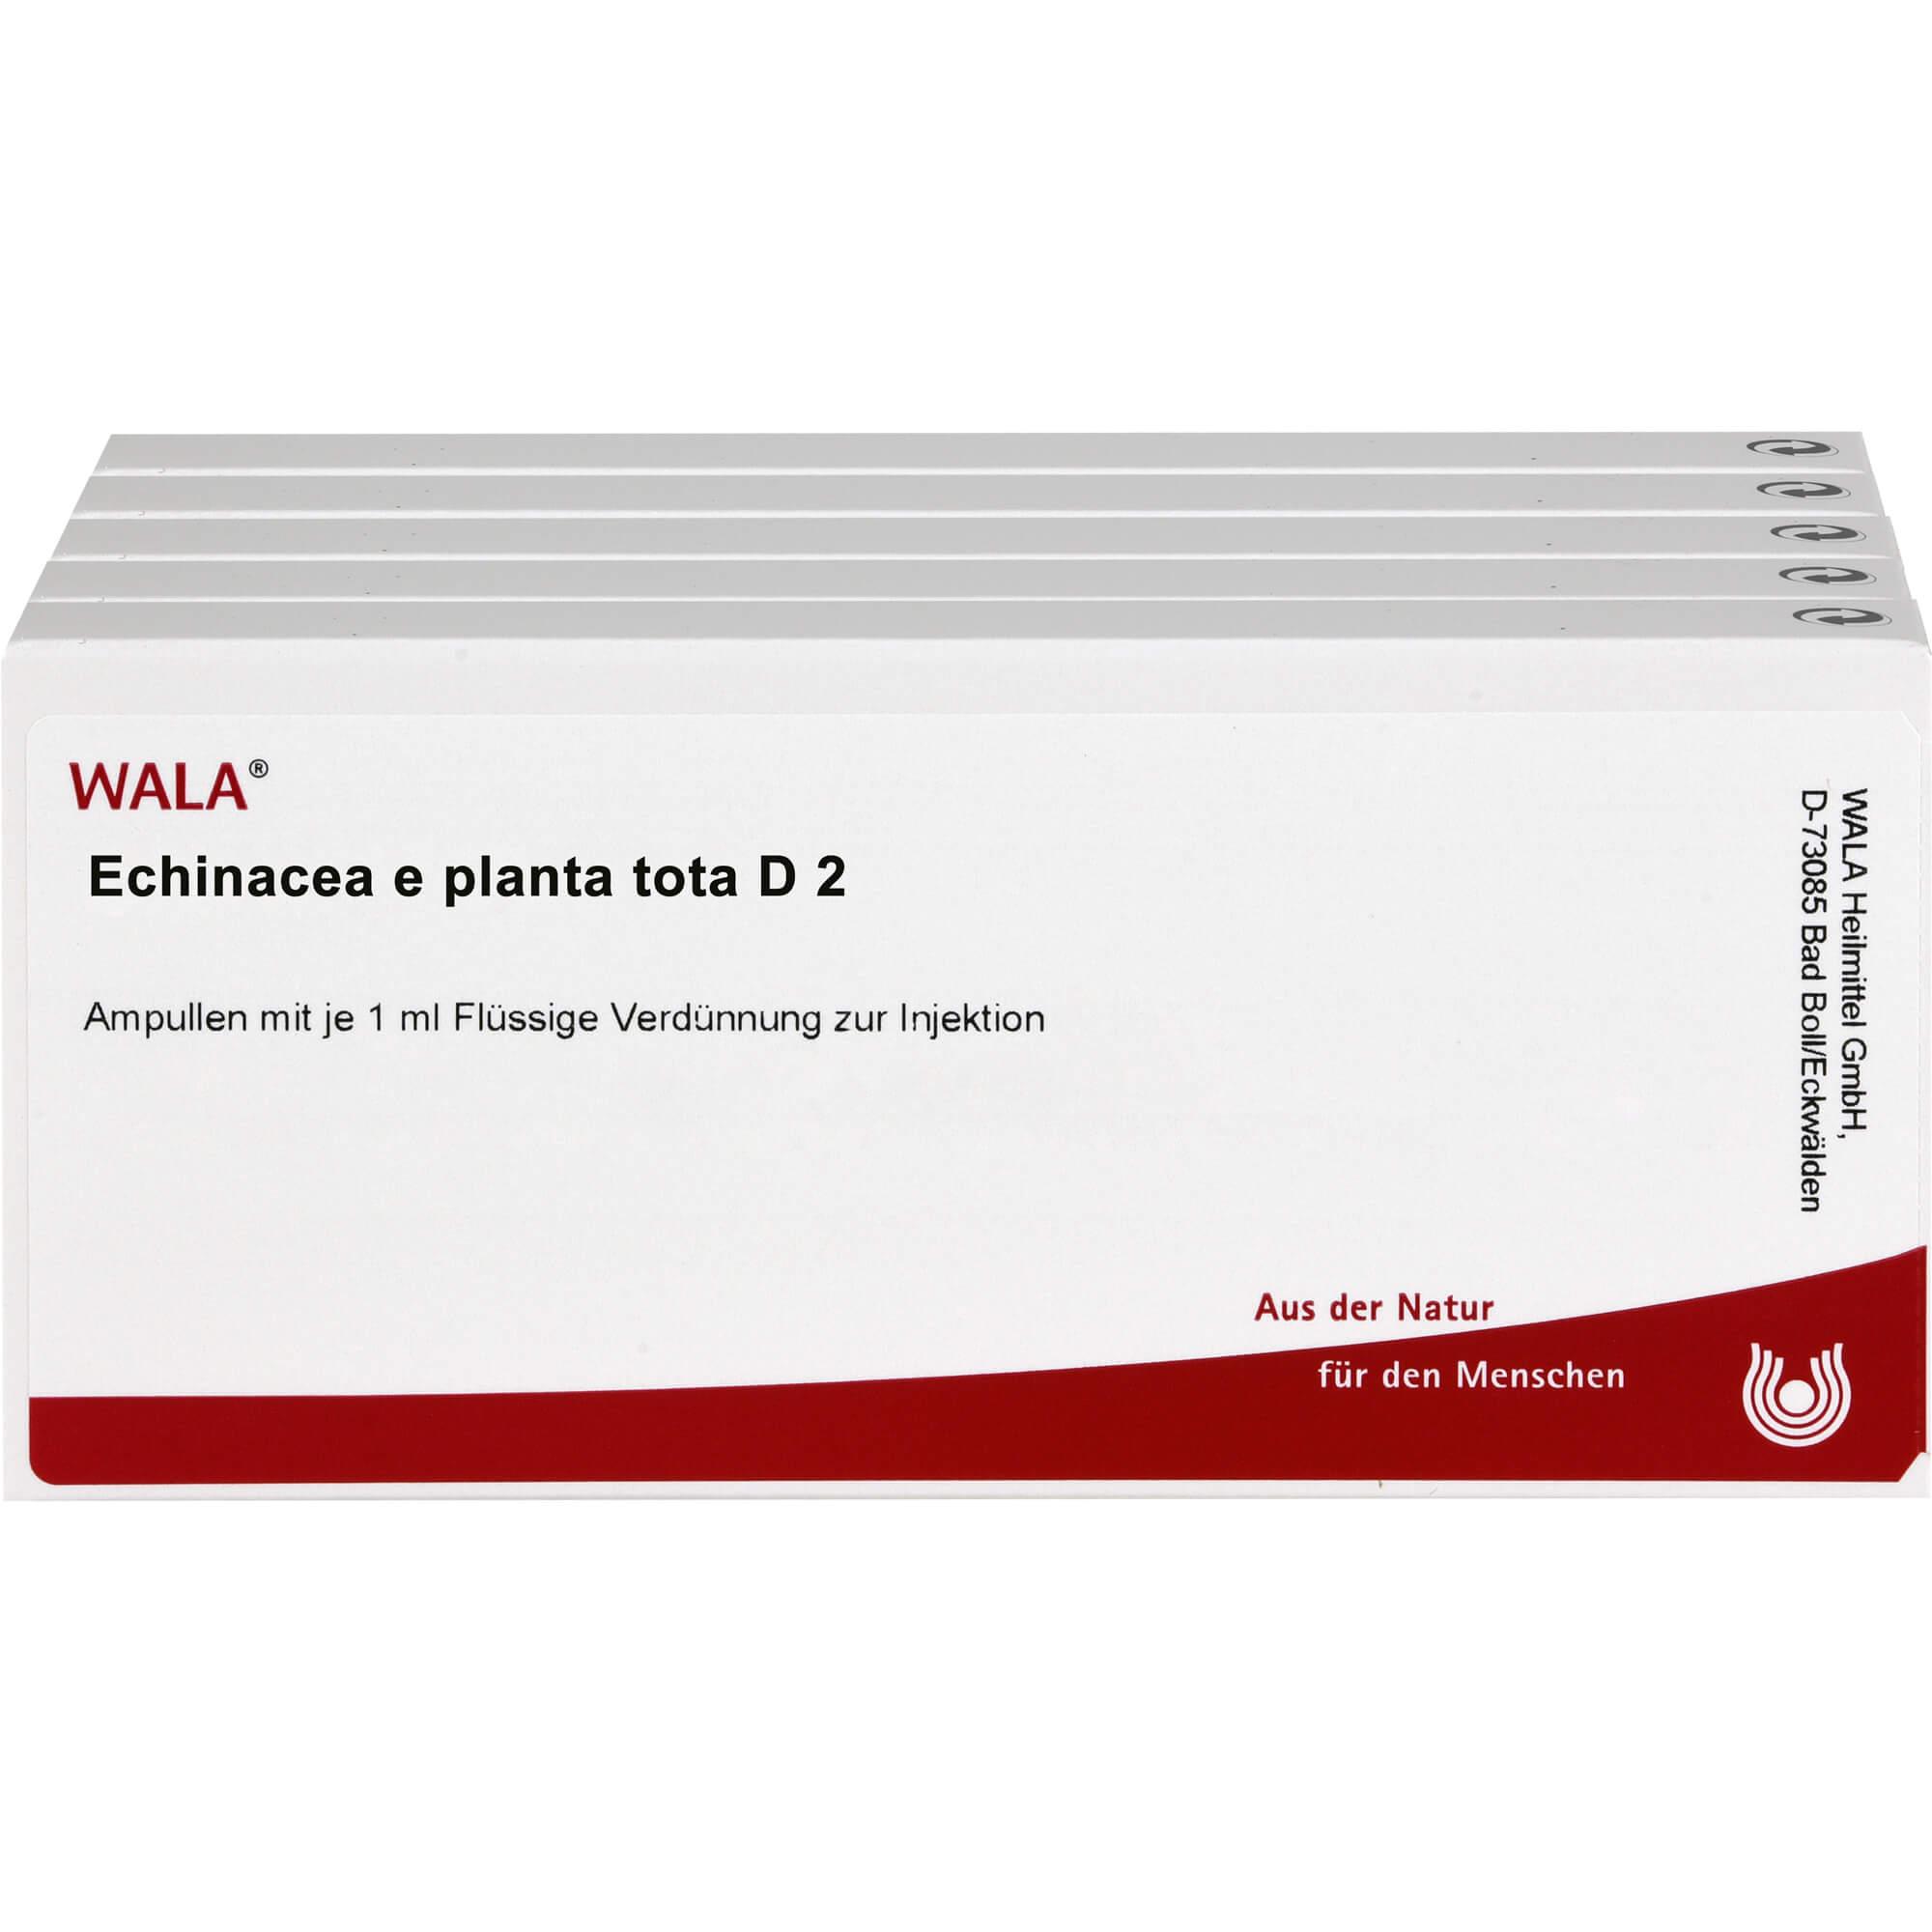 ECHINACEA-E-planta-tota-D-2-Ampullen